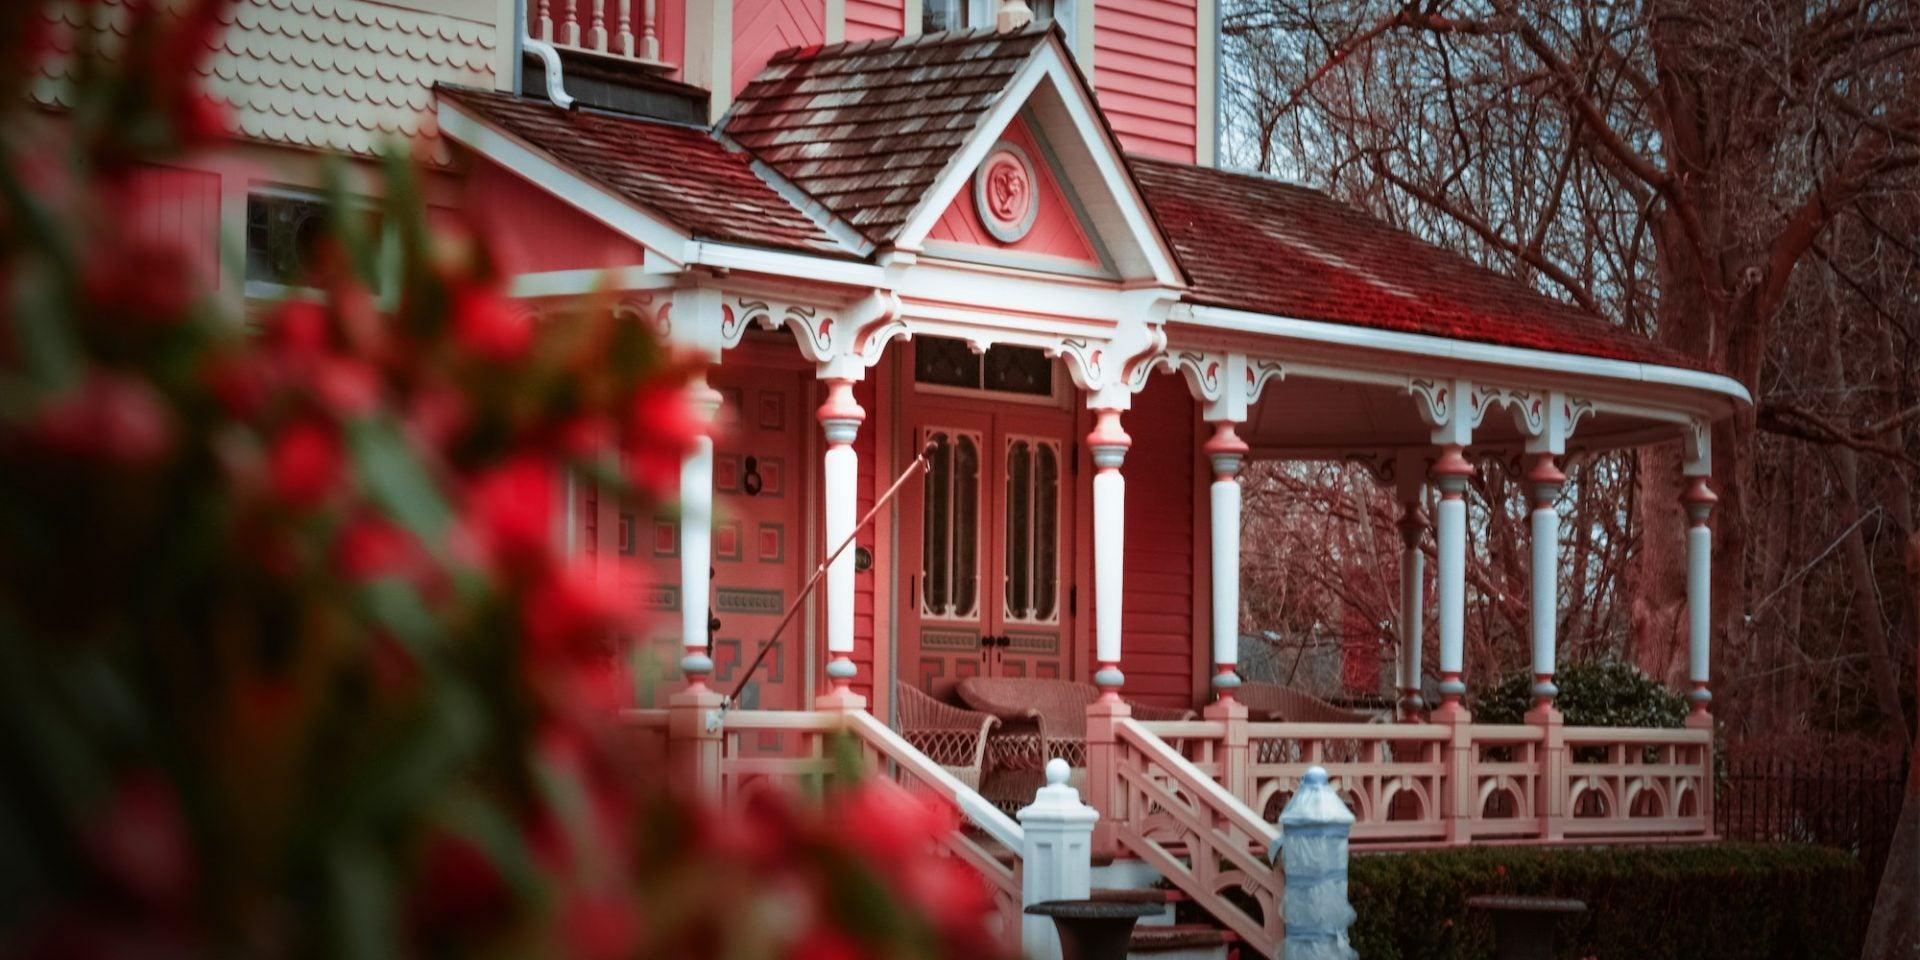 A close-up of an older home's porch